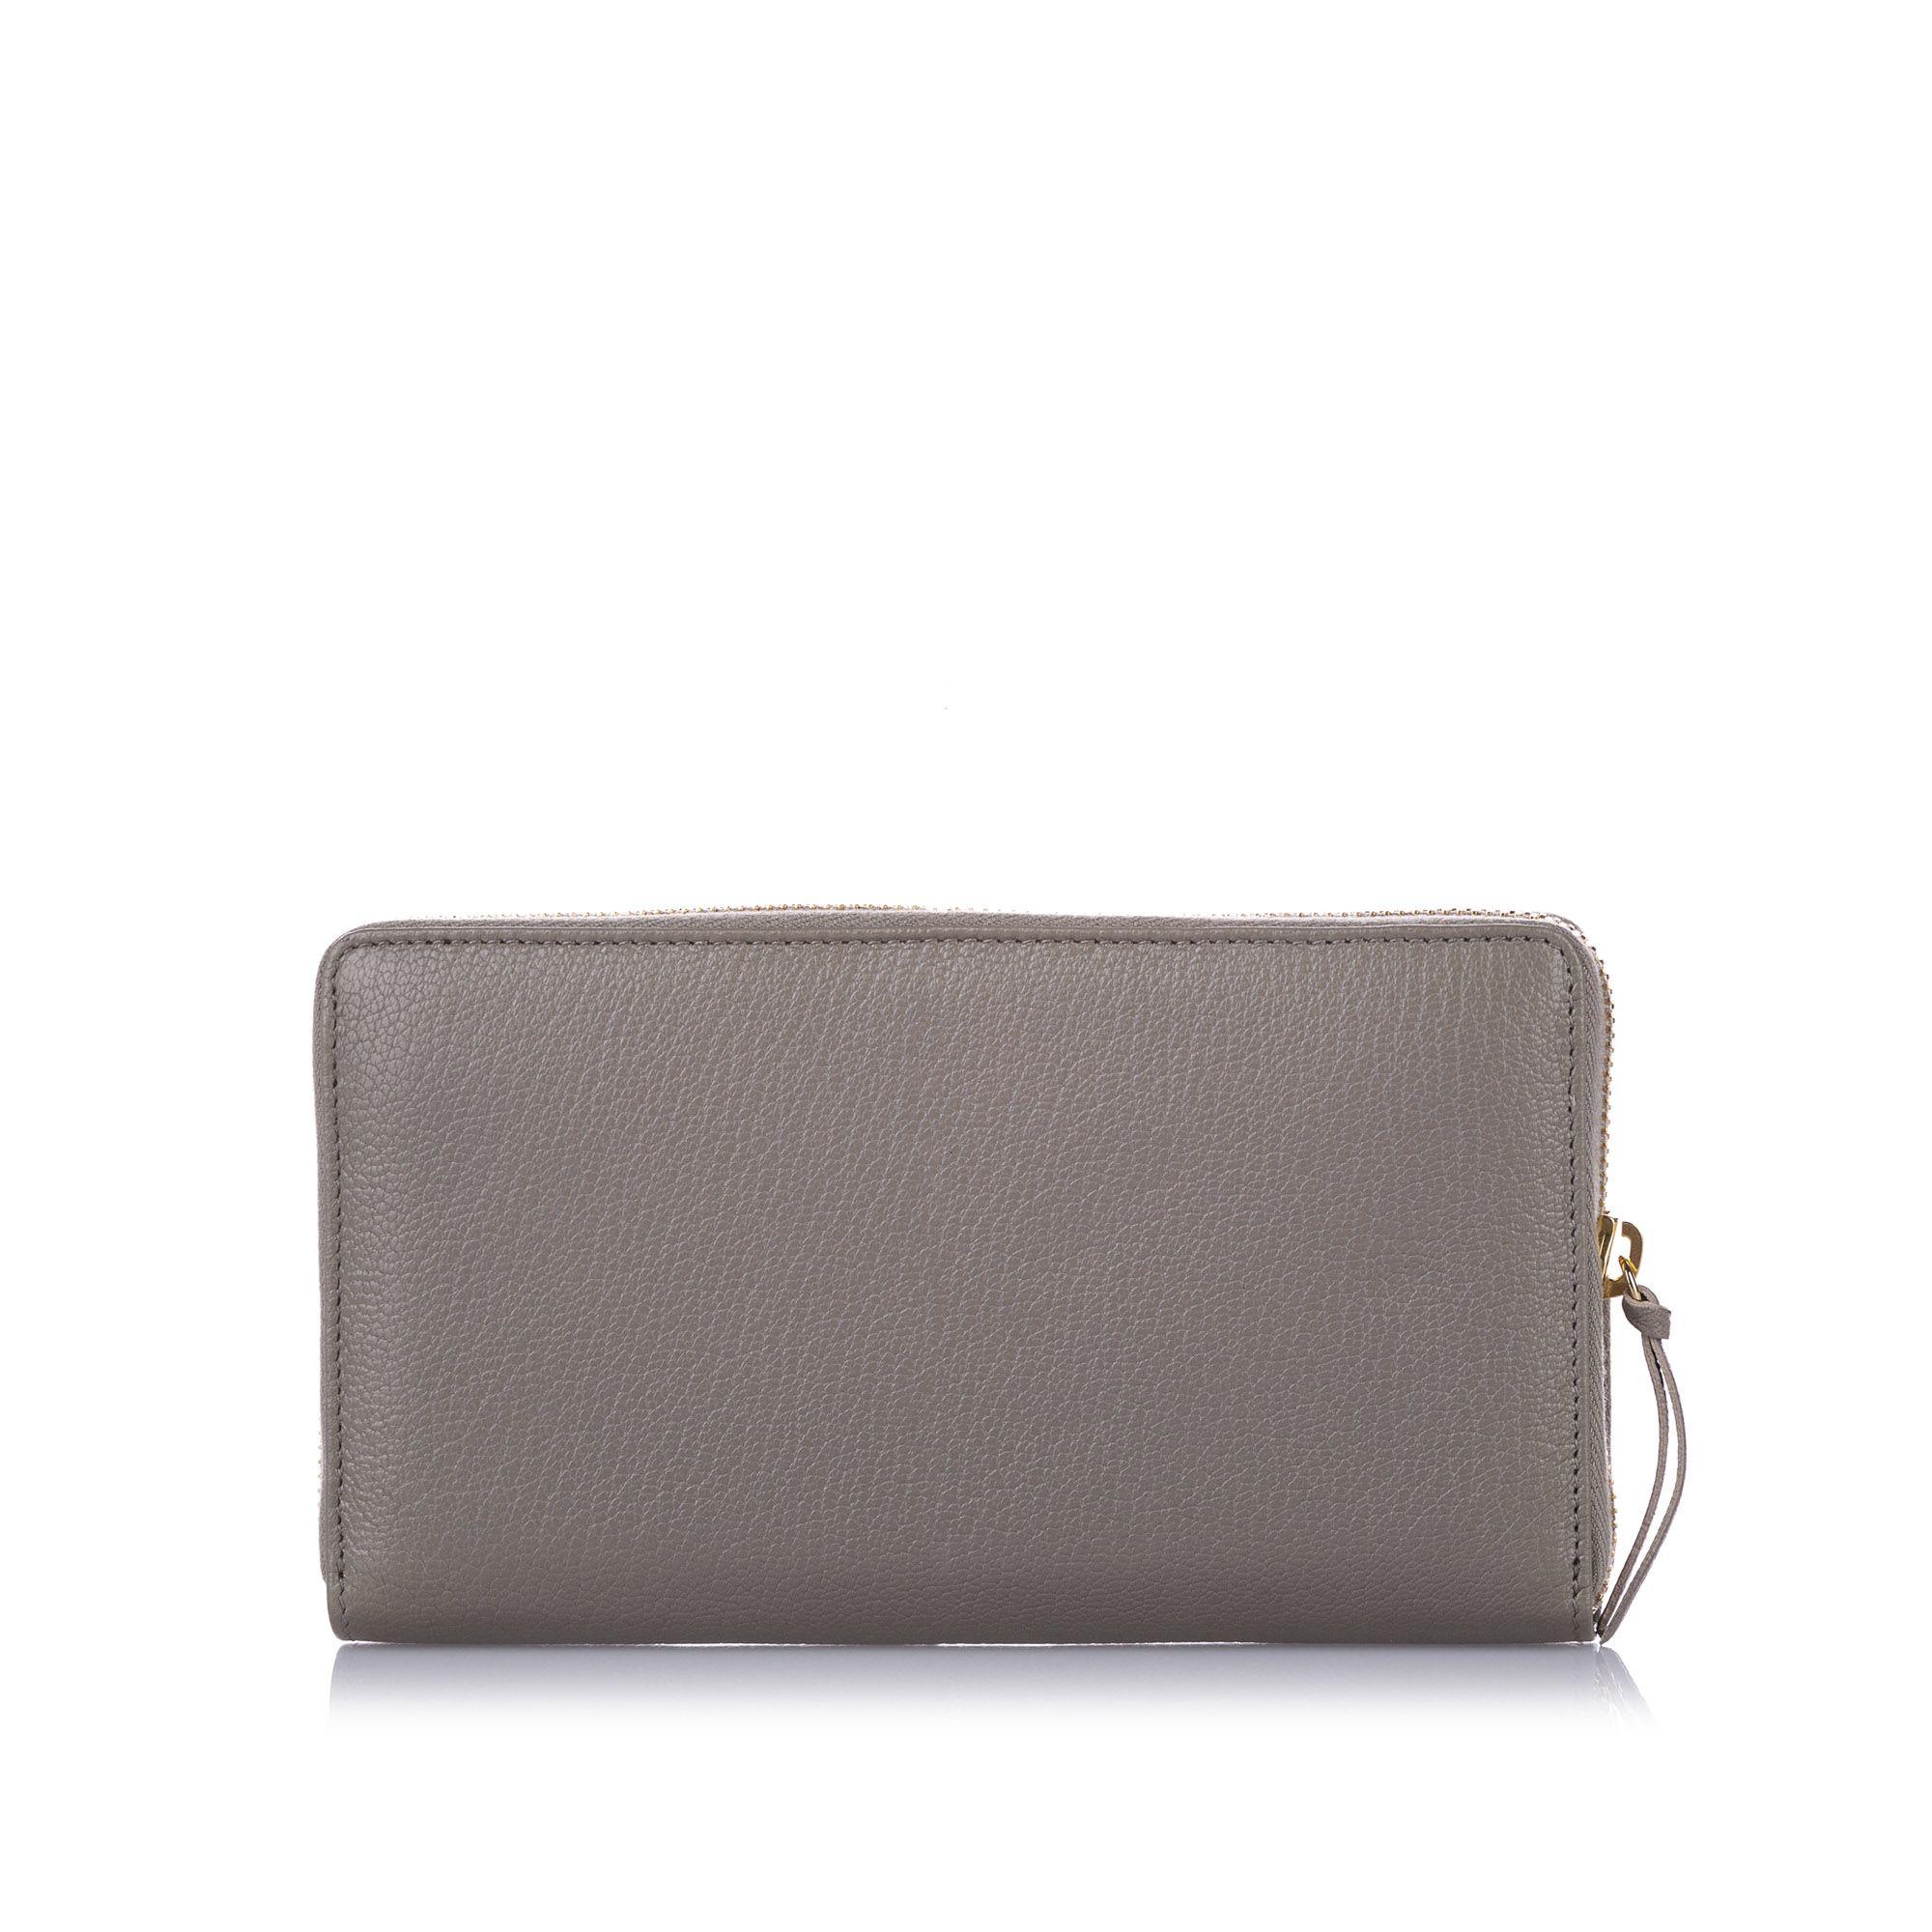 Balenciaga Classic Metallic Edge Leather Long Wallet Grey